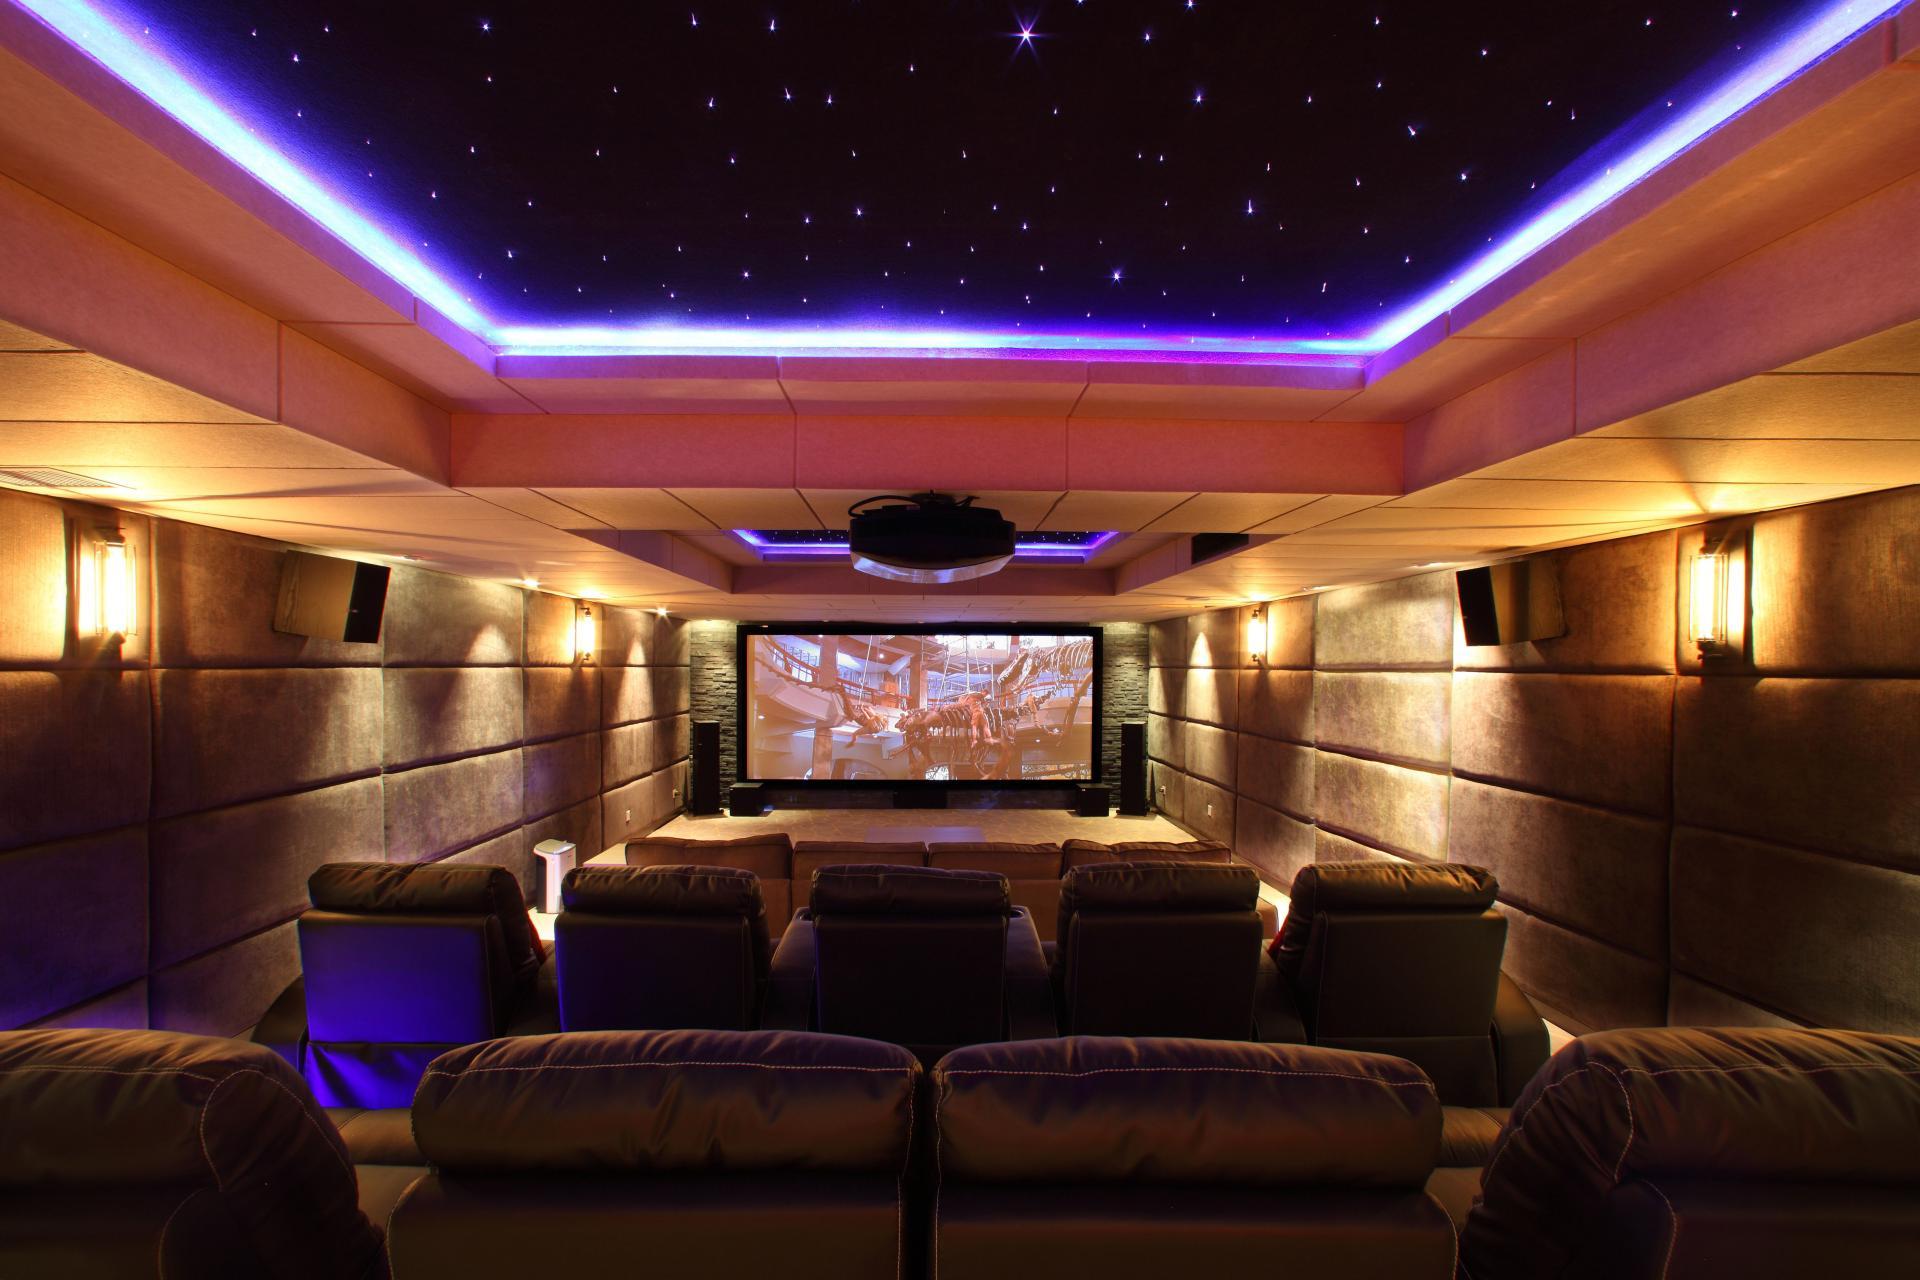 Cinema room at Somerset Heping Apartments